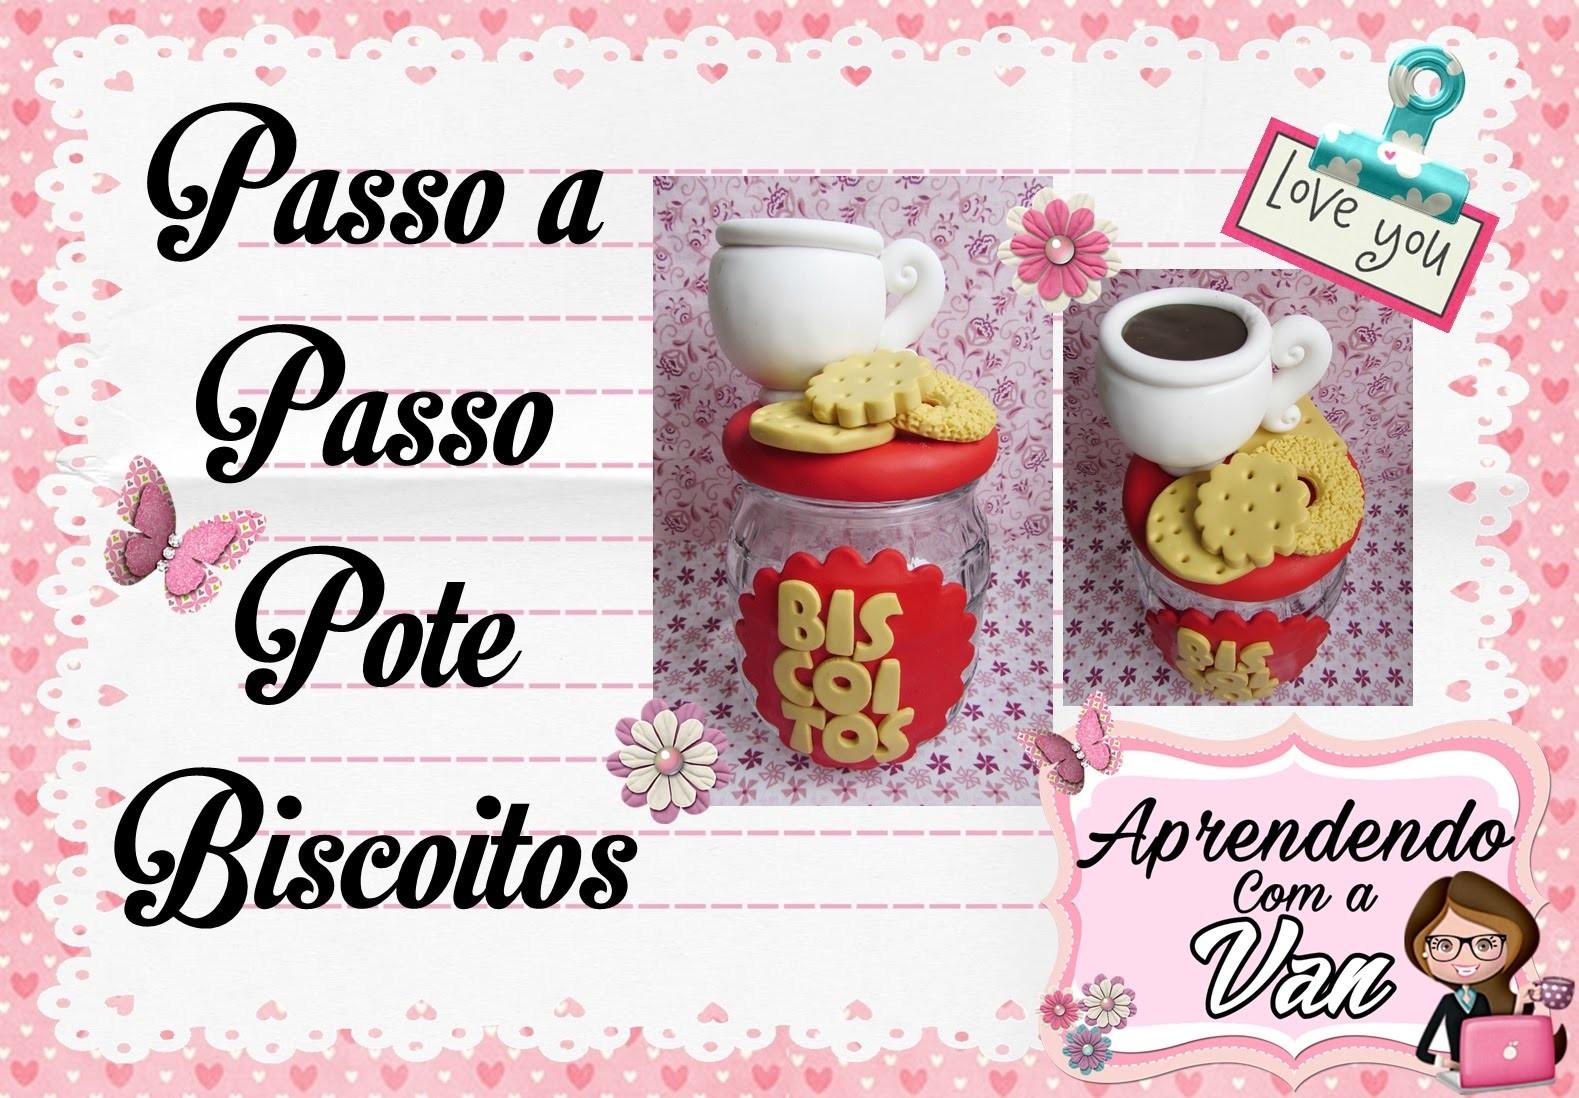 (DIY) PASSO A PASSO POTE BISCOITOS MARATONA POTES #9